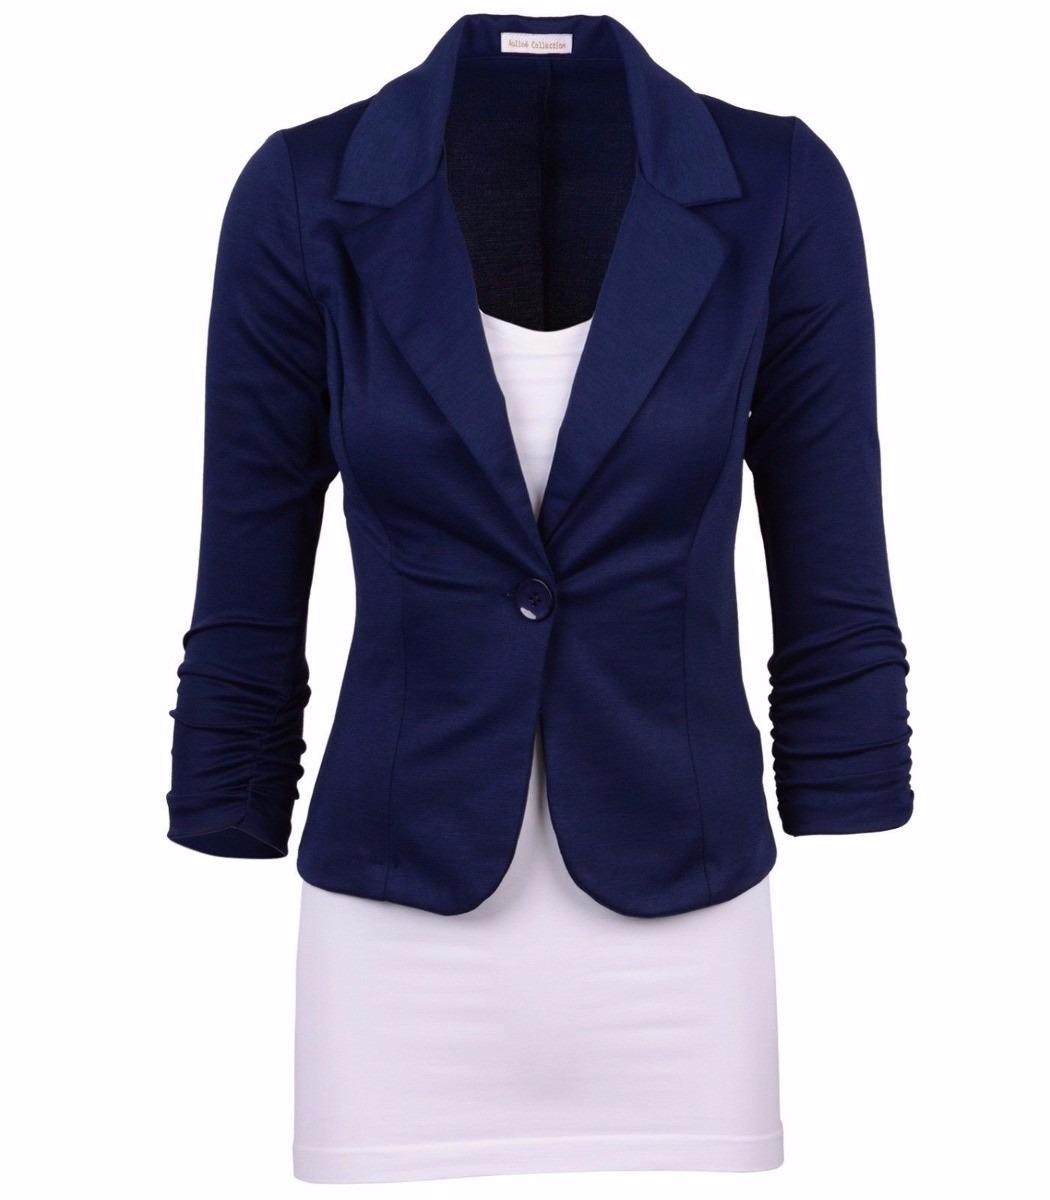 Blazer Feminino Azul Escuro  861e15e1138c6